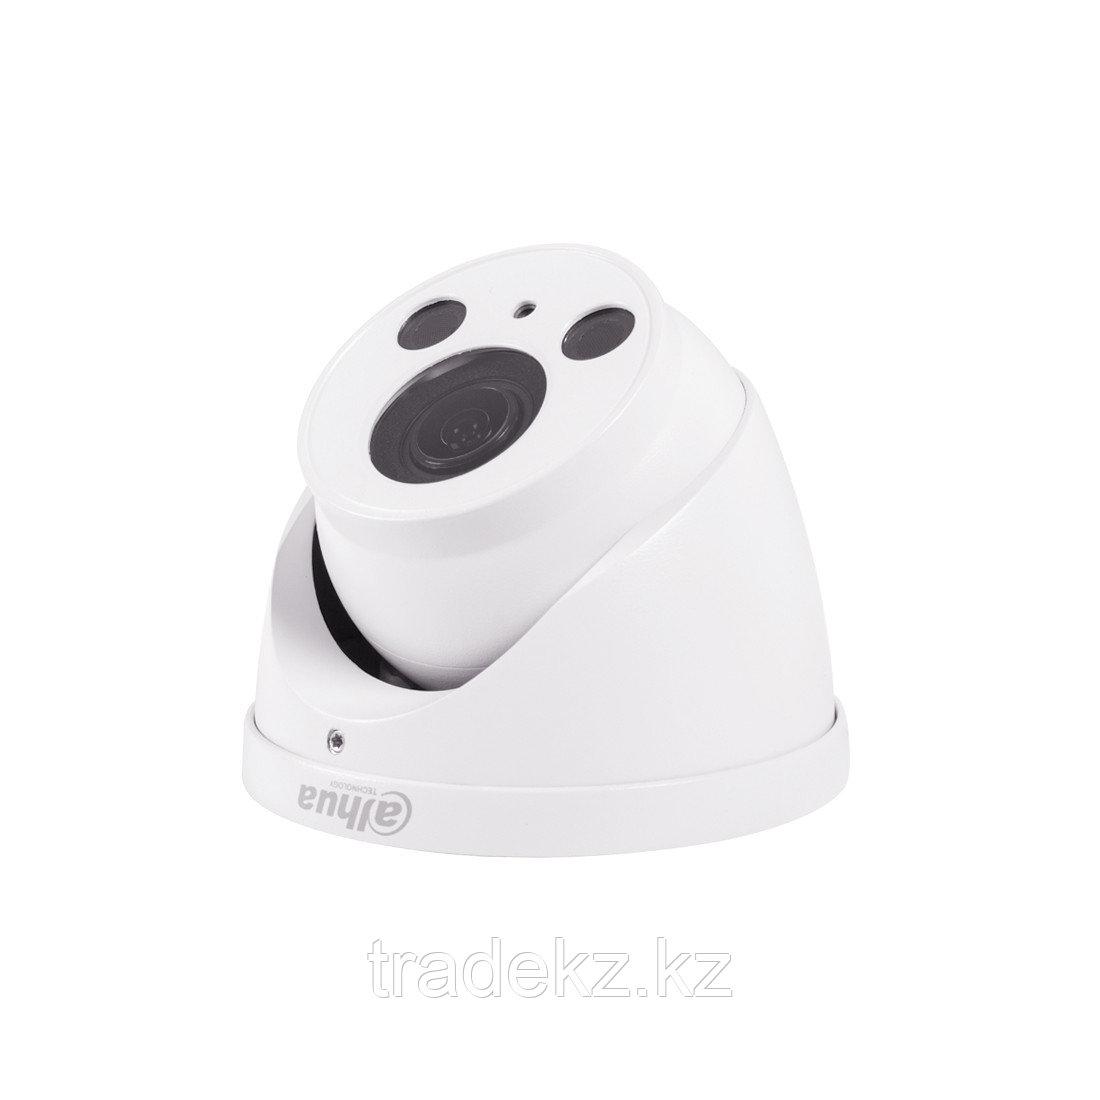 Купольная сетевая камера Dahua DH-IPC-HDW2431RP-ZS